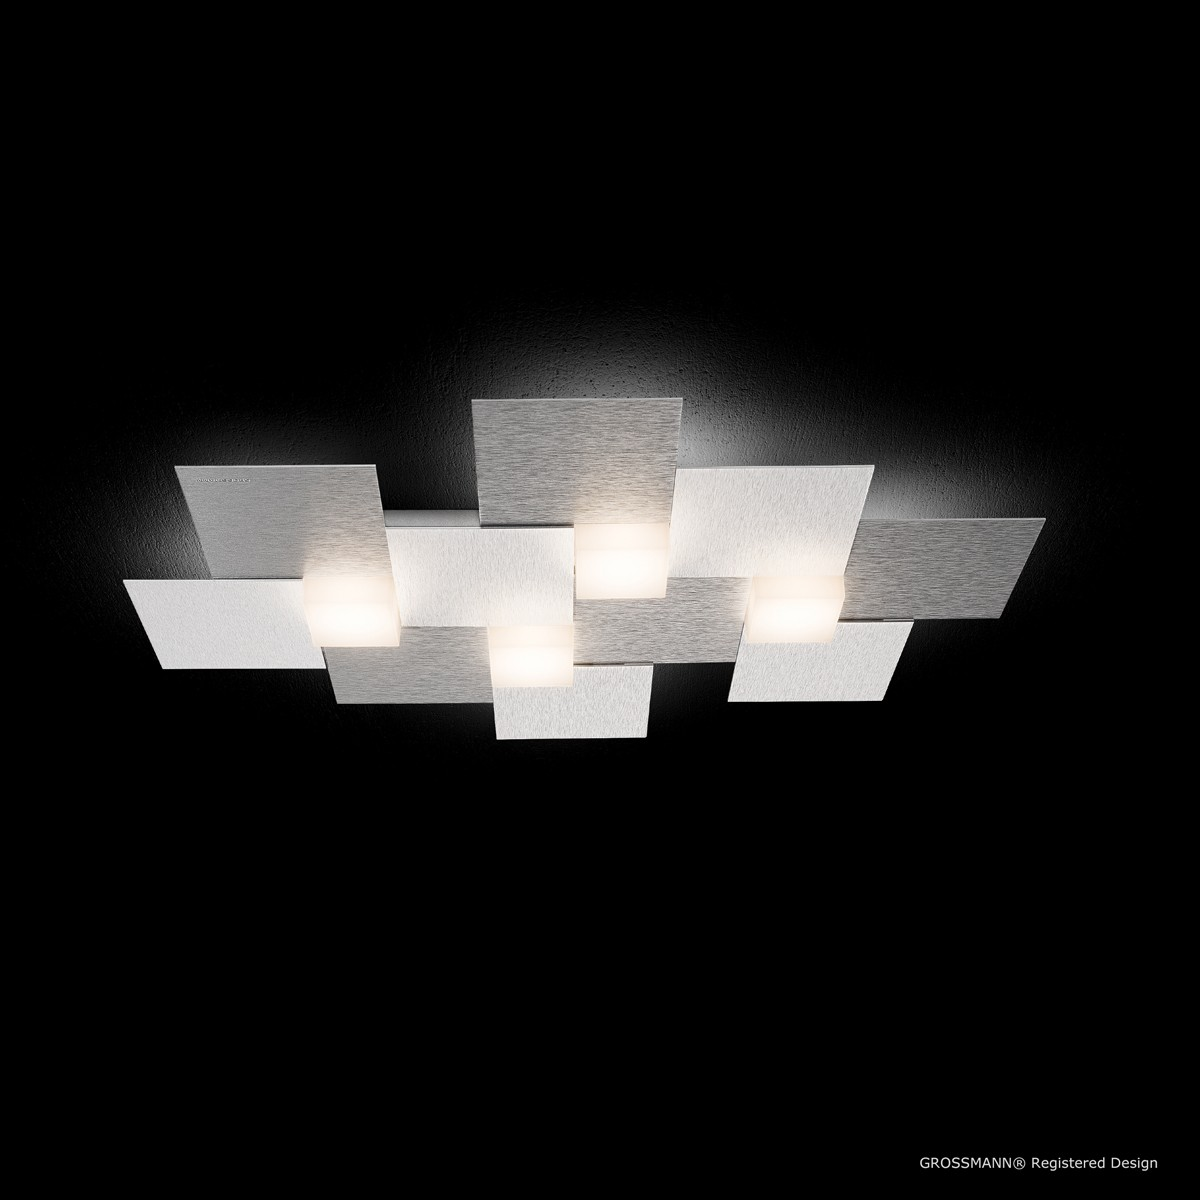 Grossmann Creo LED Deckenleuchte, Alu gebürstet, 55 x 38,5 cm